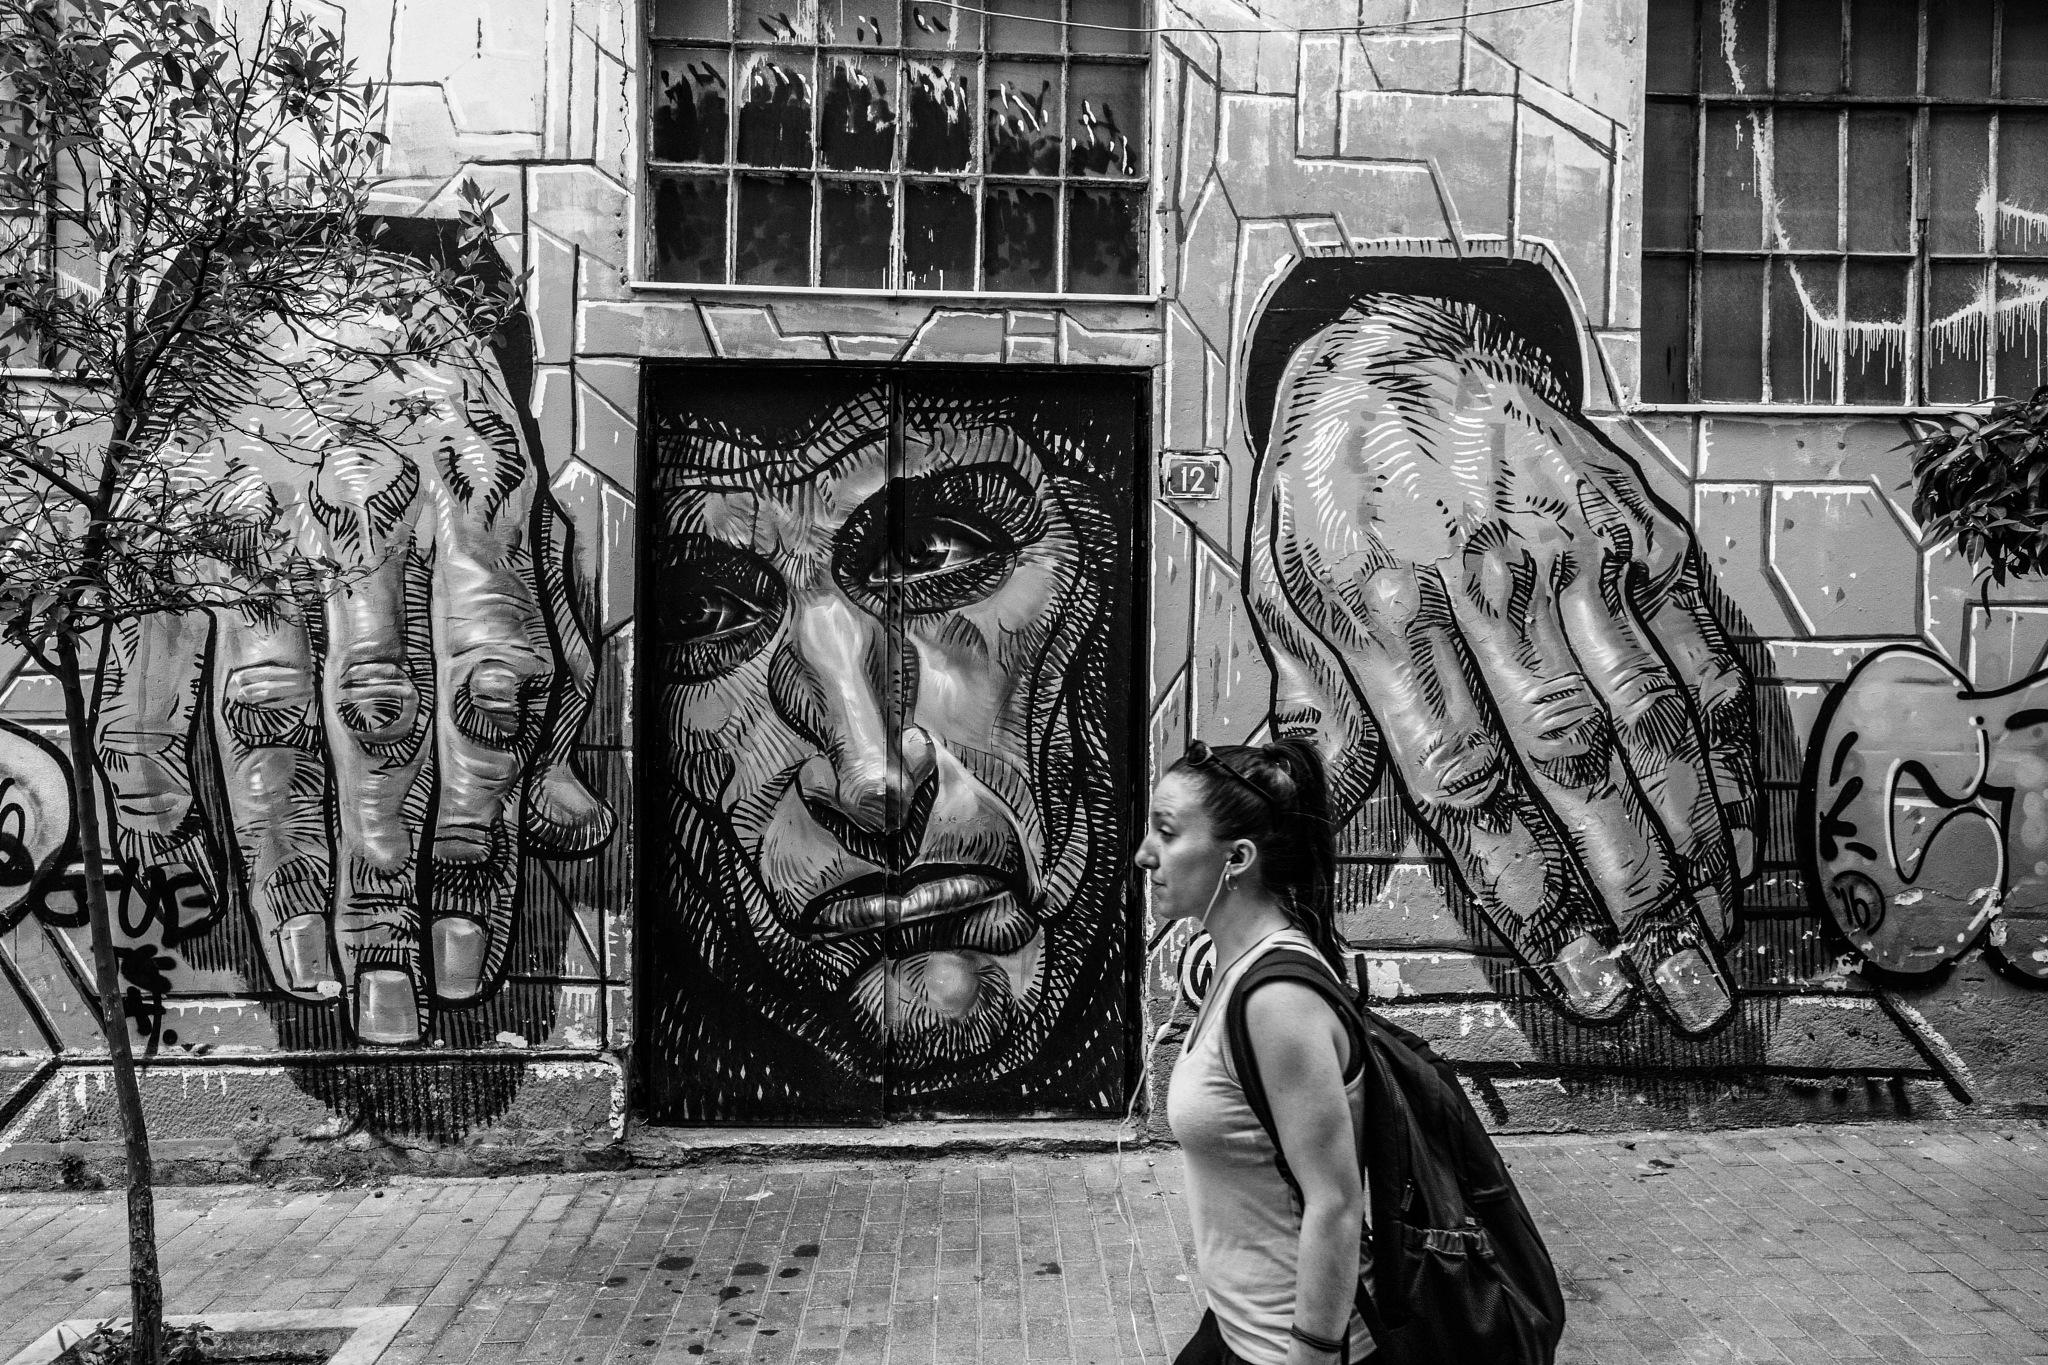 Untitled by panagiotis